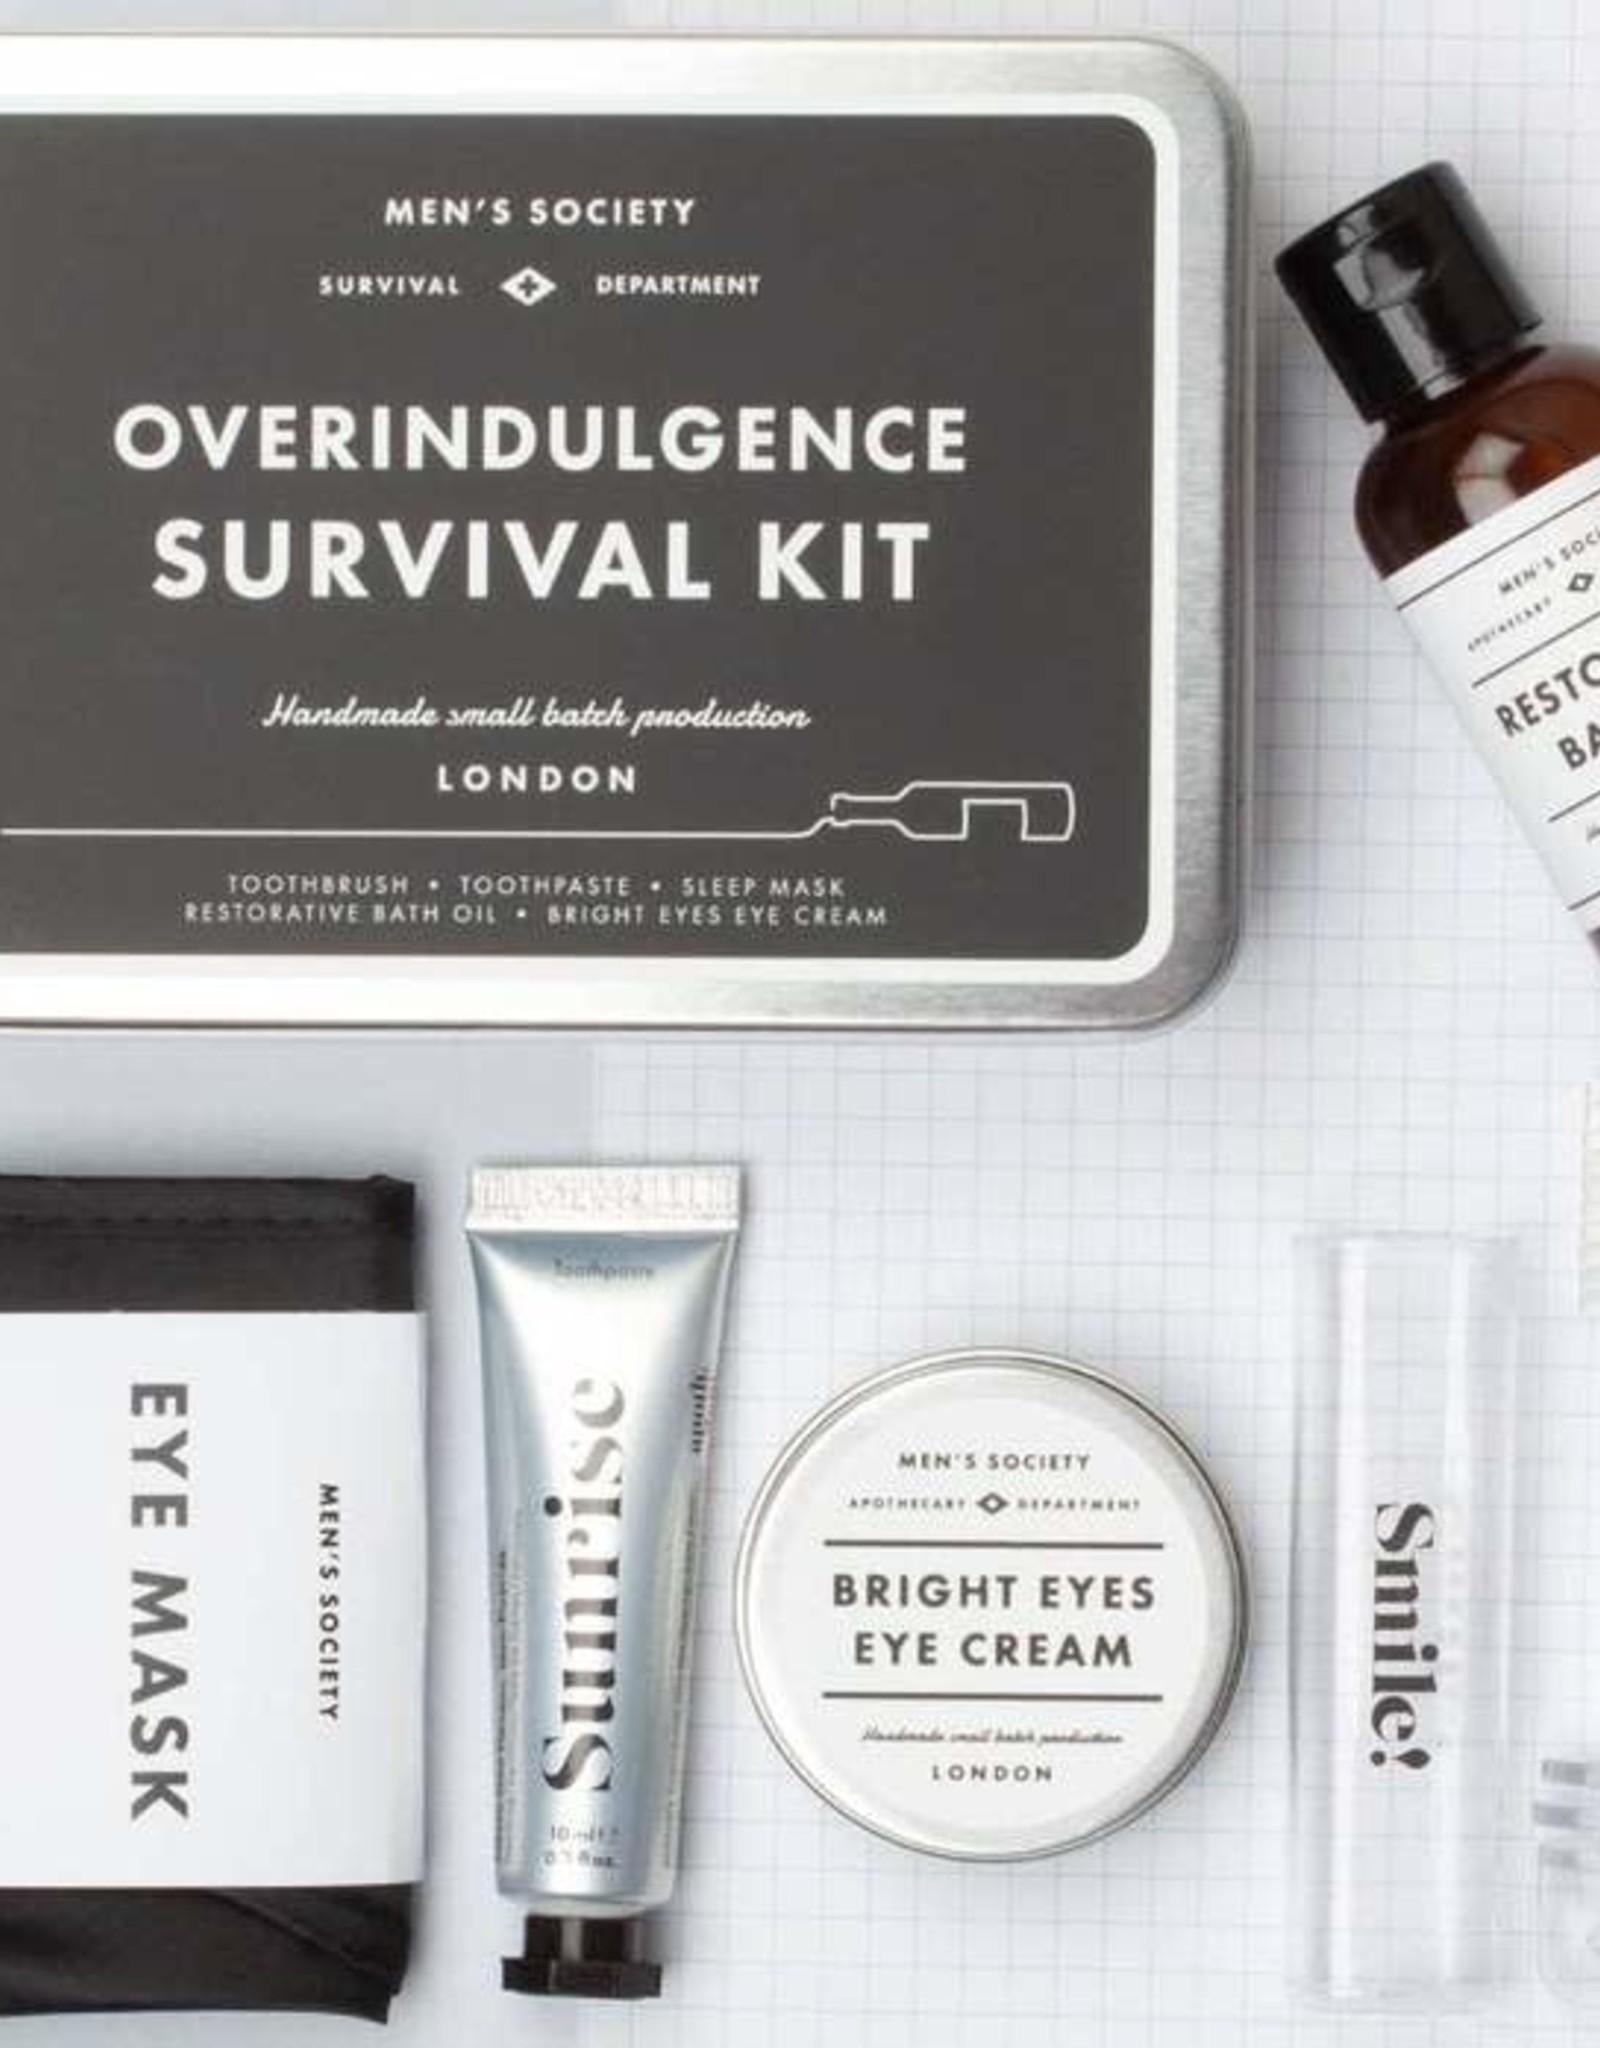 Men's Society Overindulgence Kit